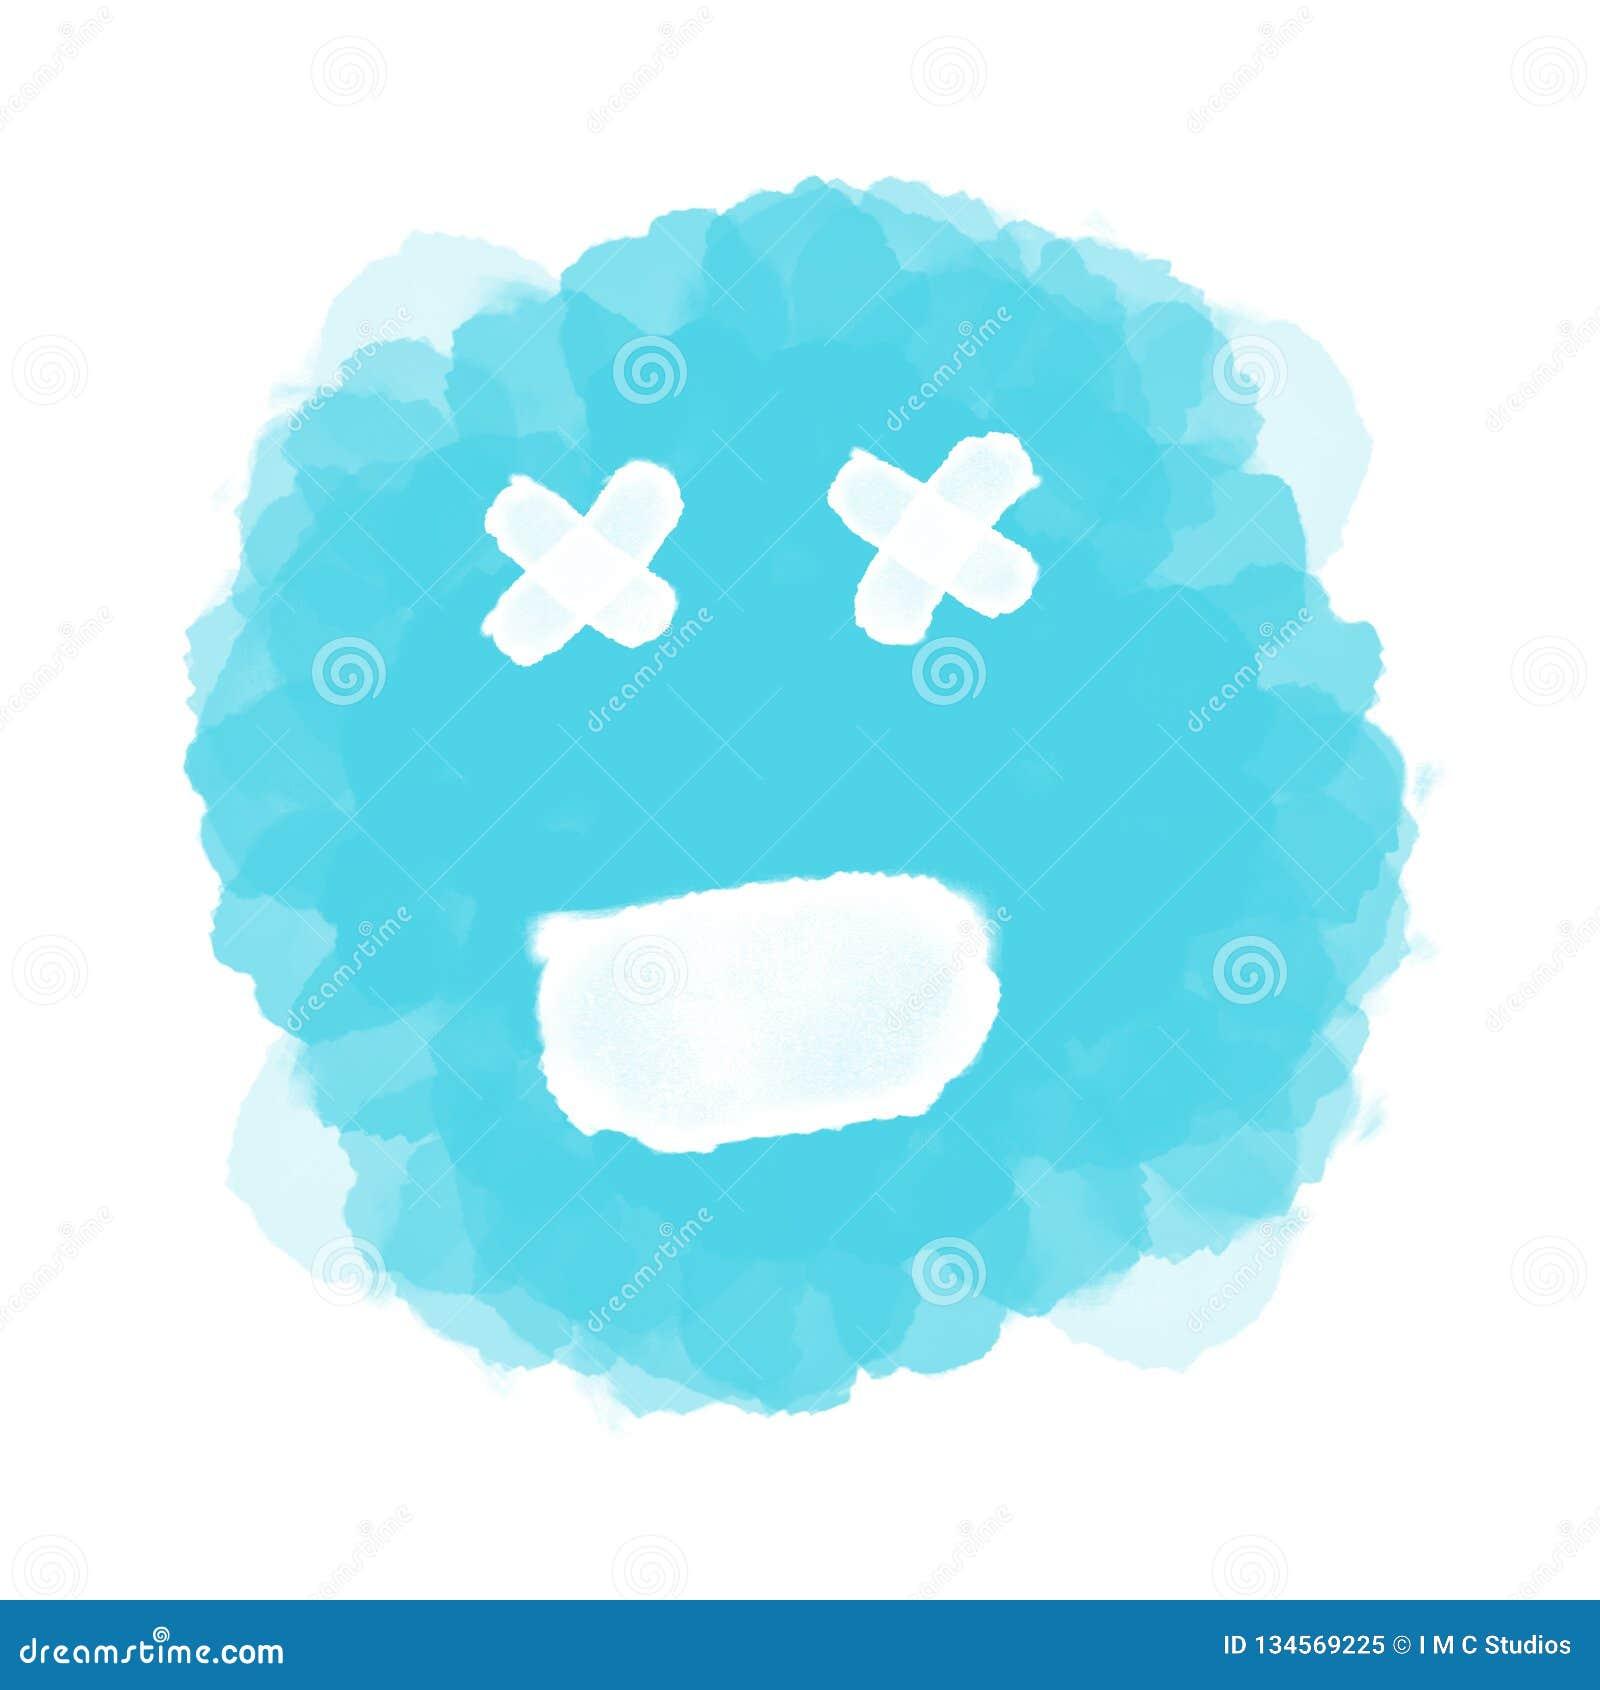 Abstract blue emoji/emoticon on white